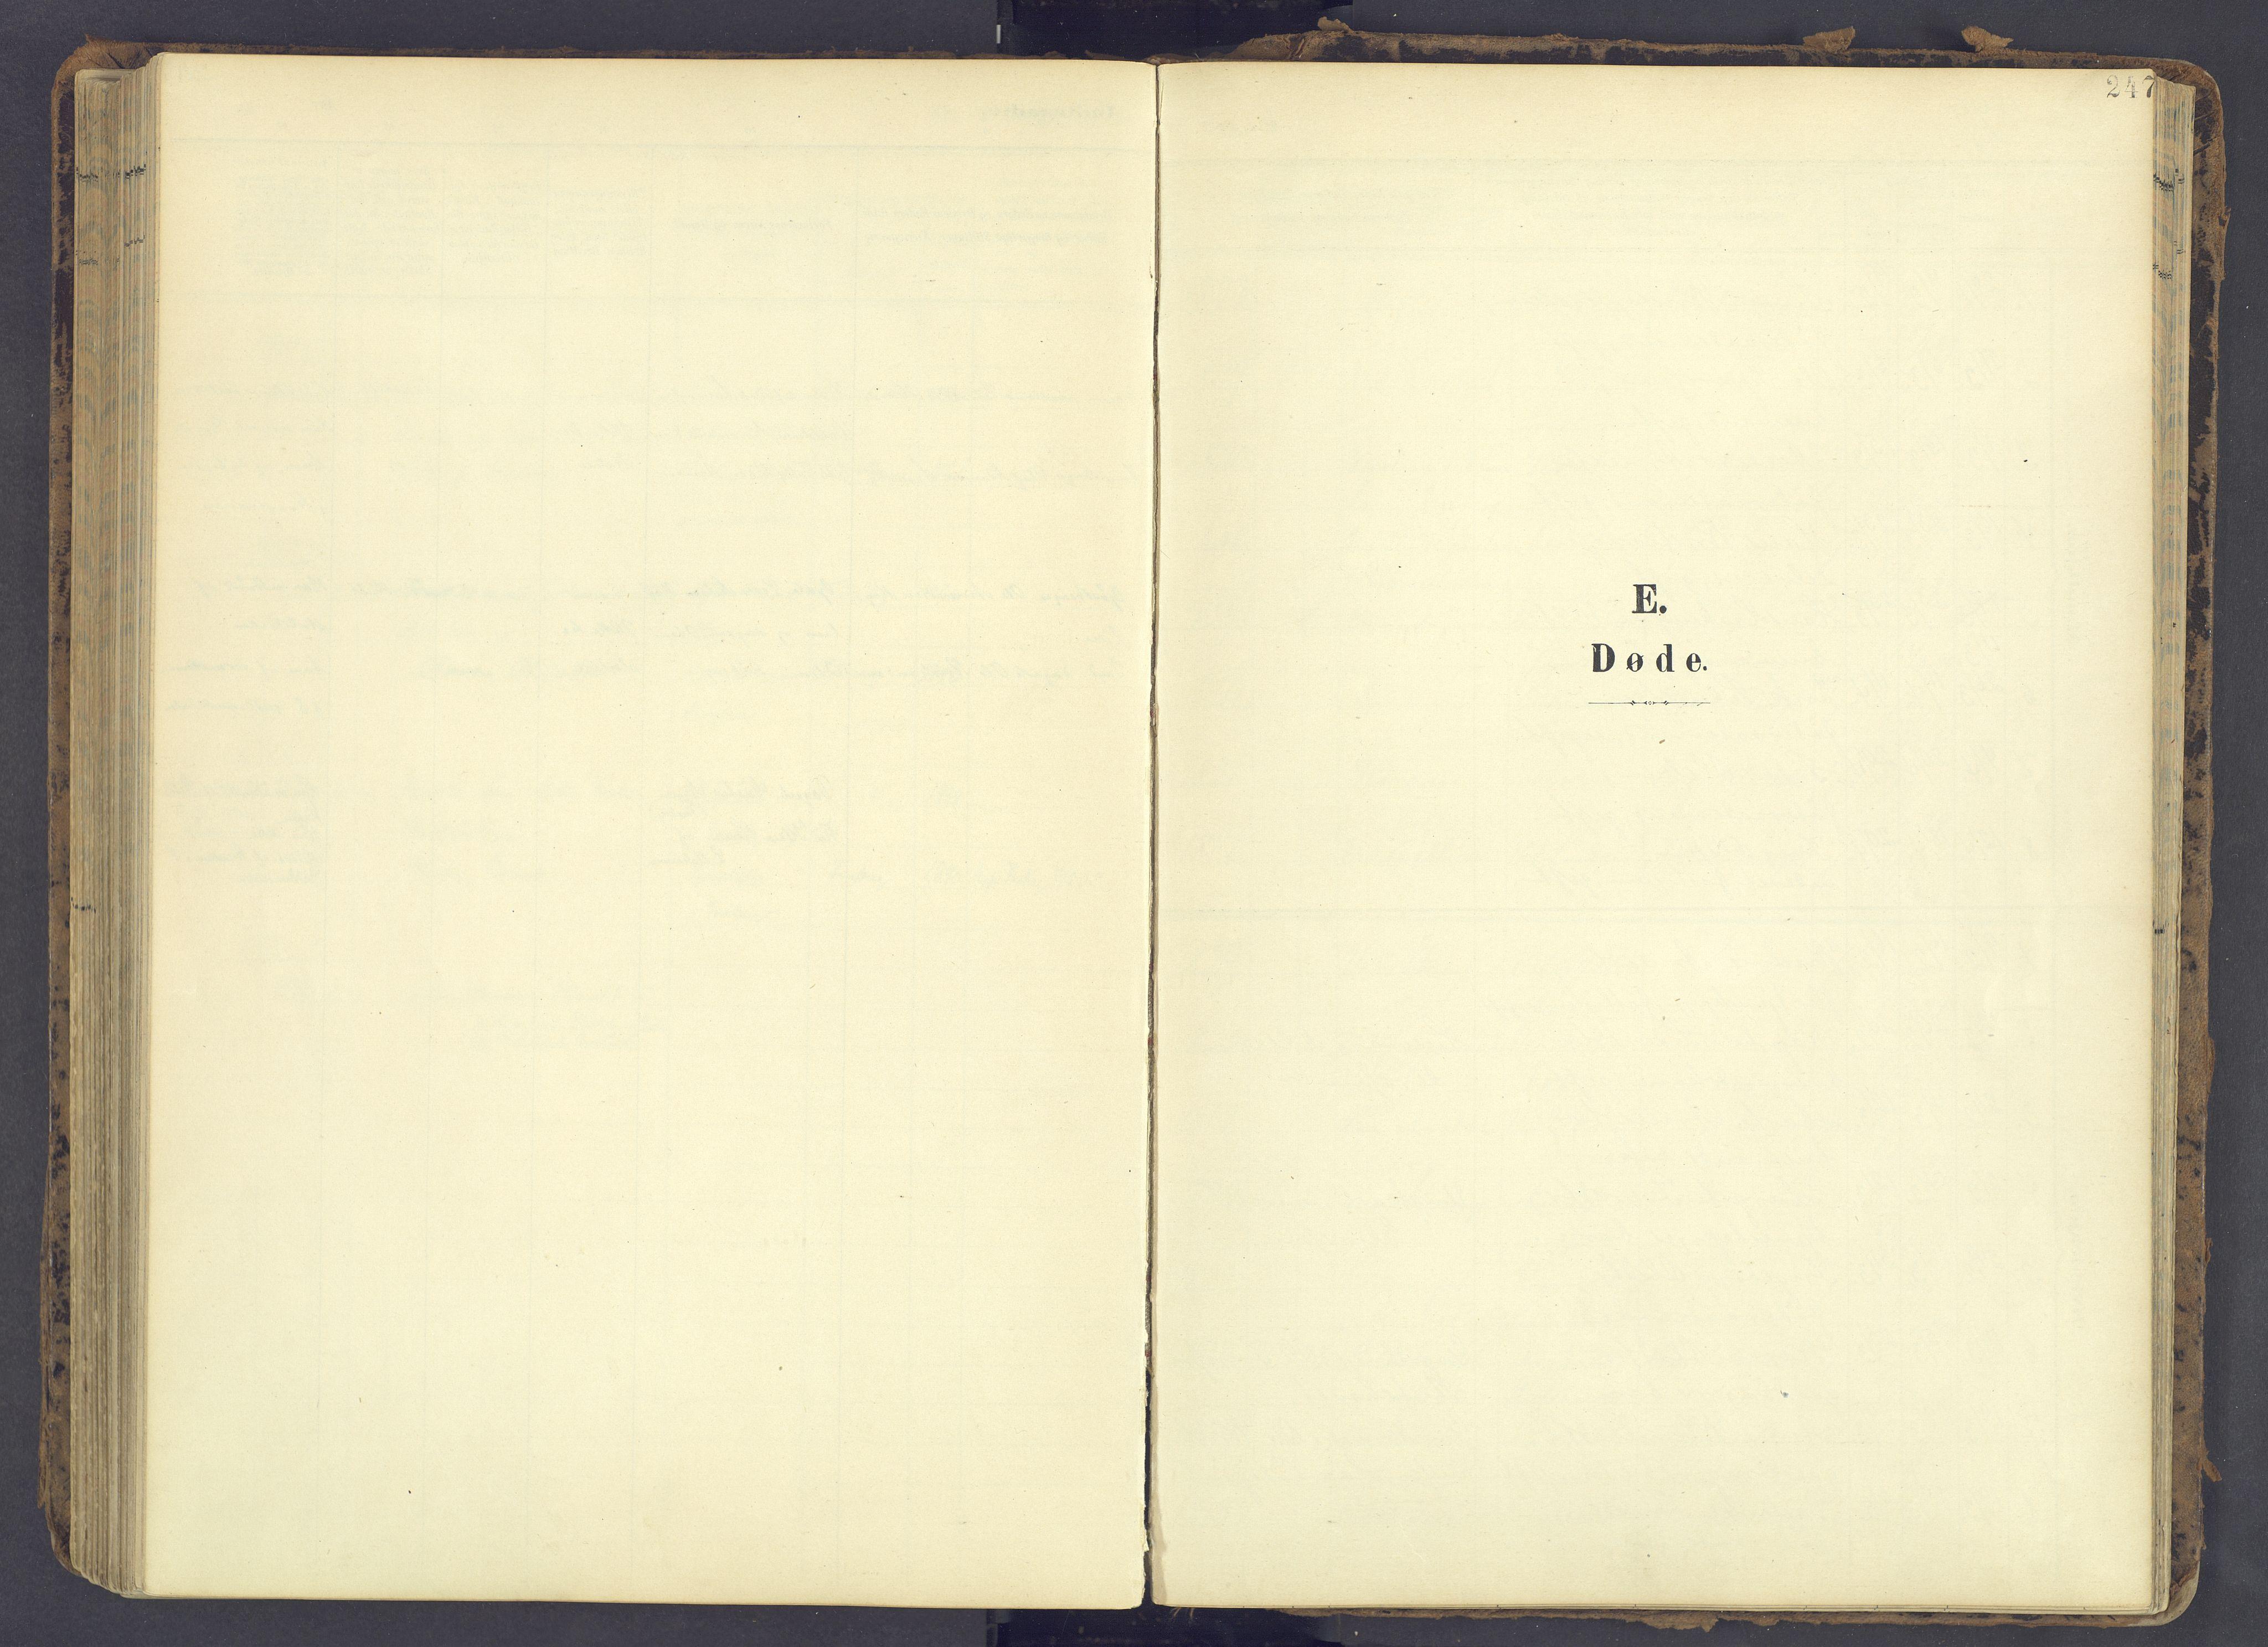 SAH, Fåberg prestekontor, Ministerialbok nr. 12, 1899-1915, s. 247